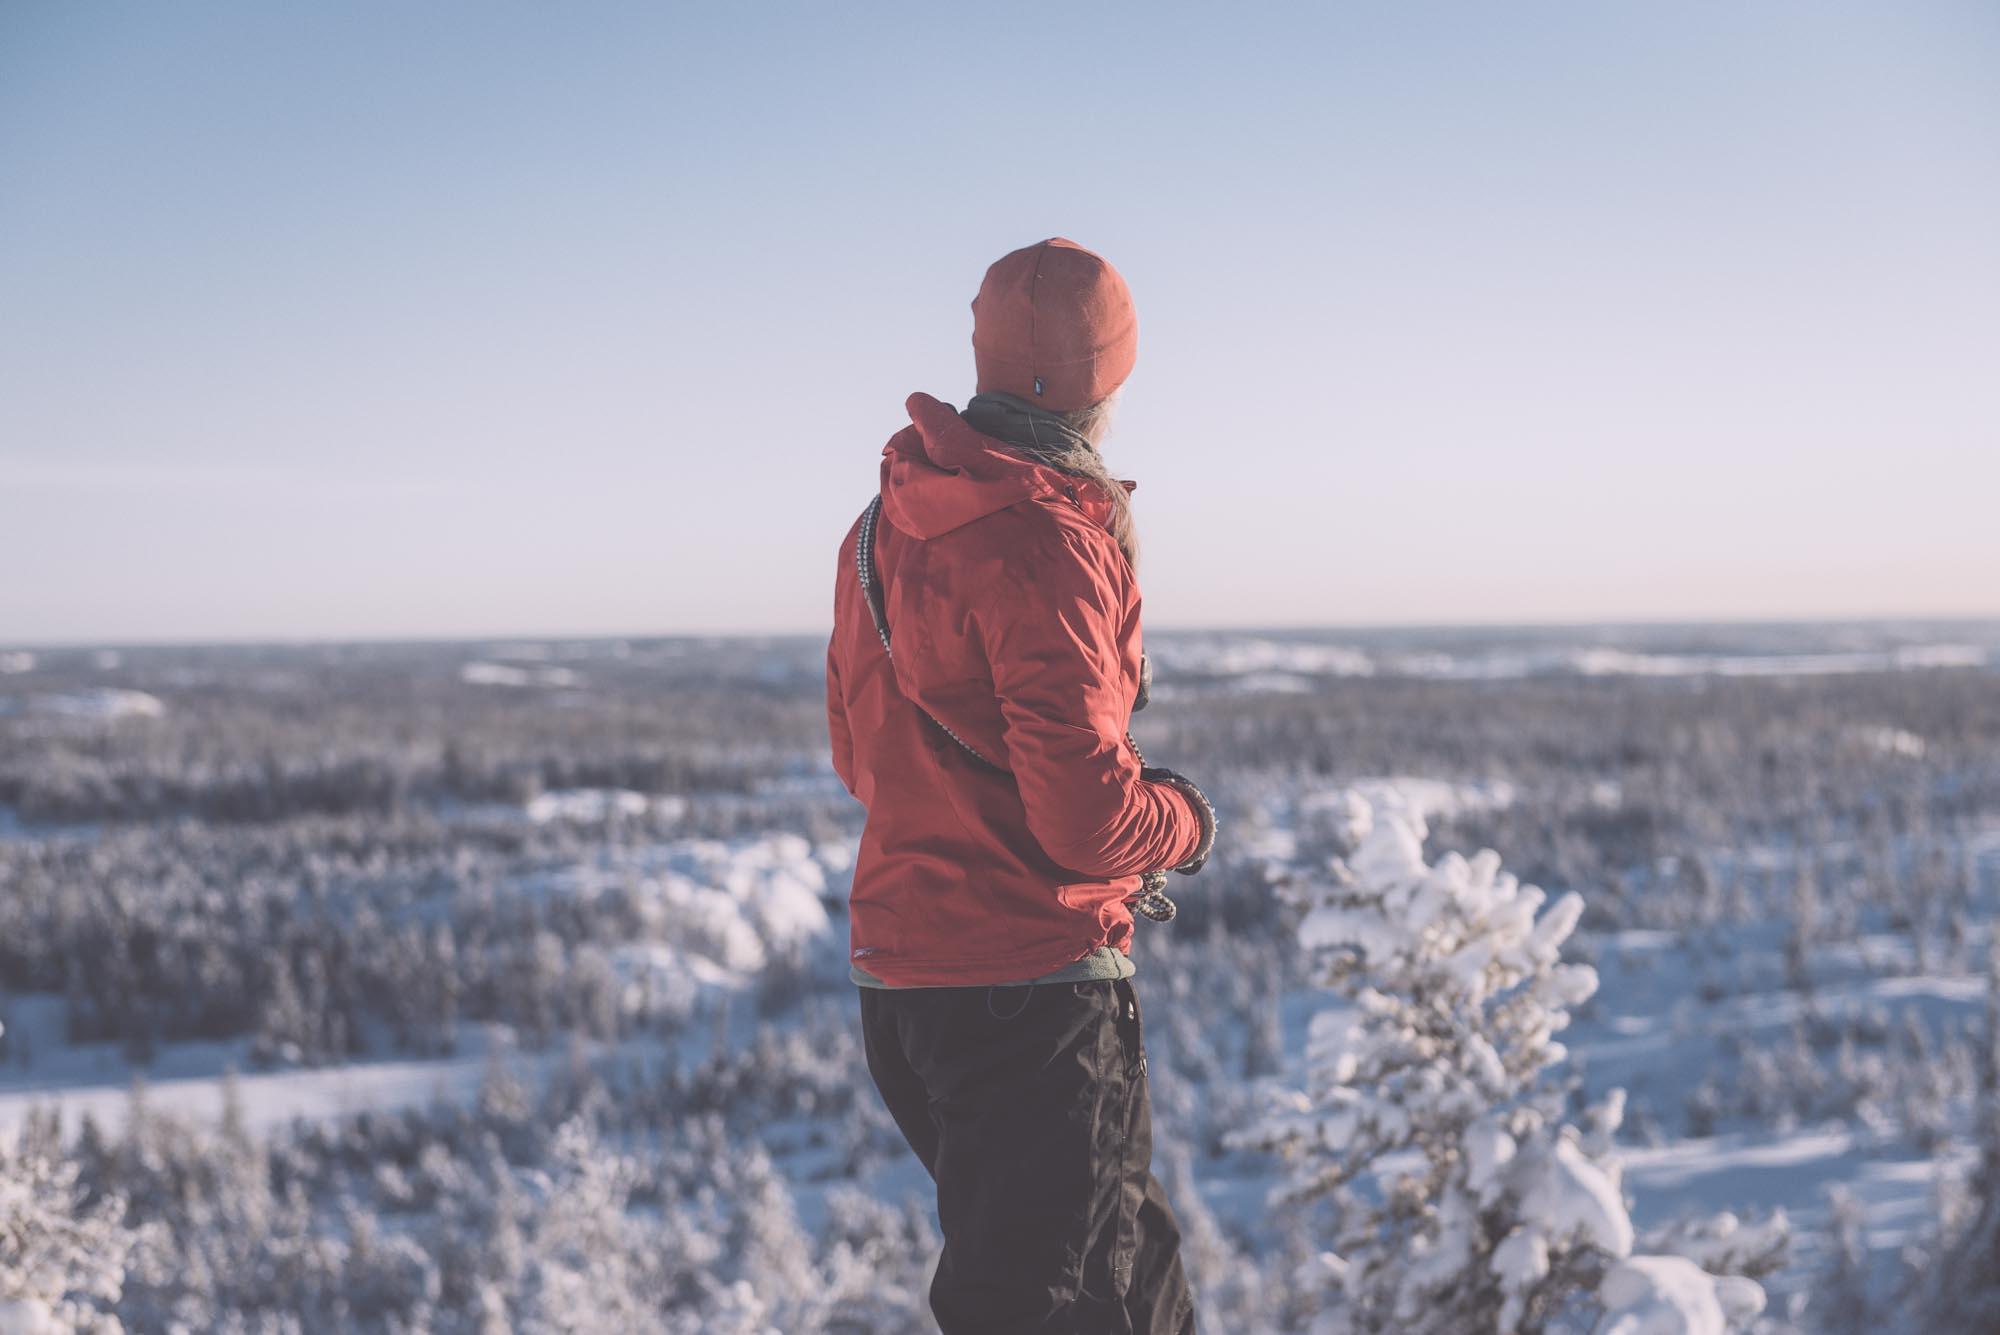 Winter Wonders by Kyle Thomas